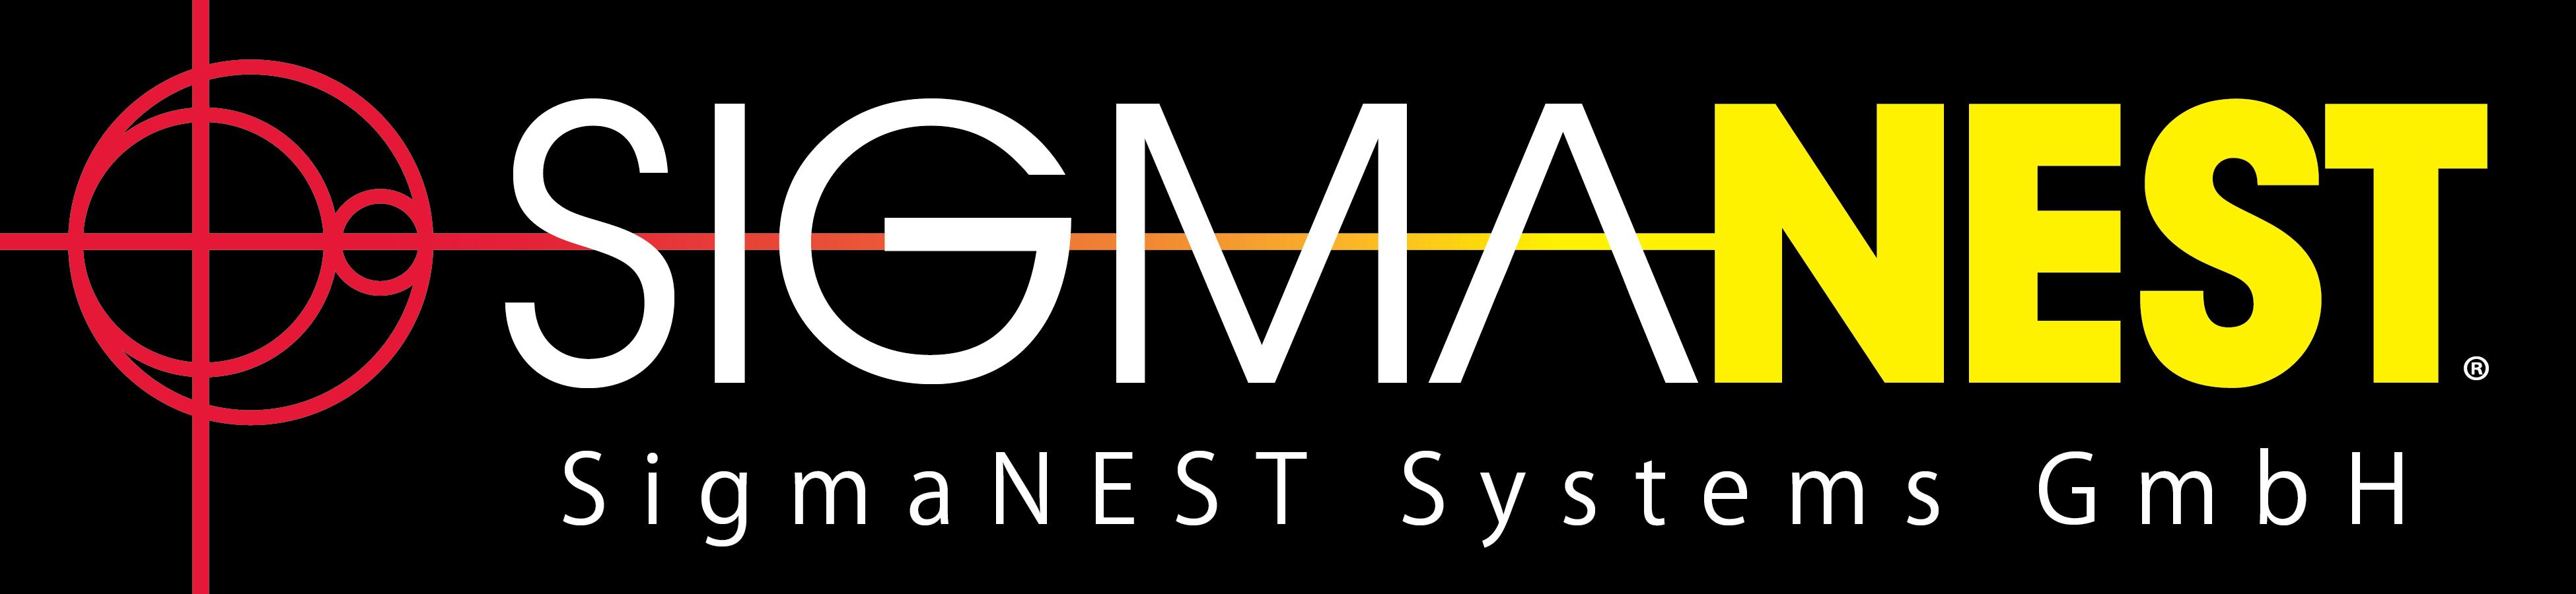 SigmaNEST Systems GmbH Logo